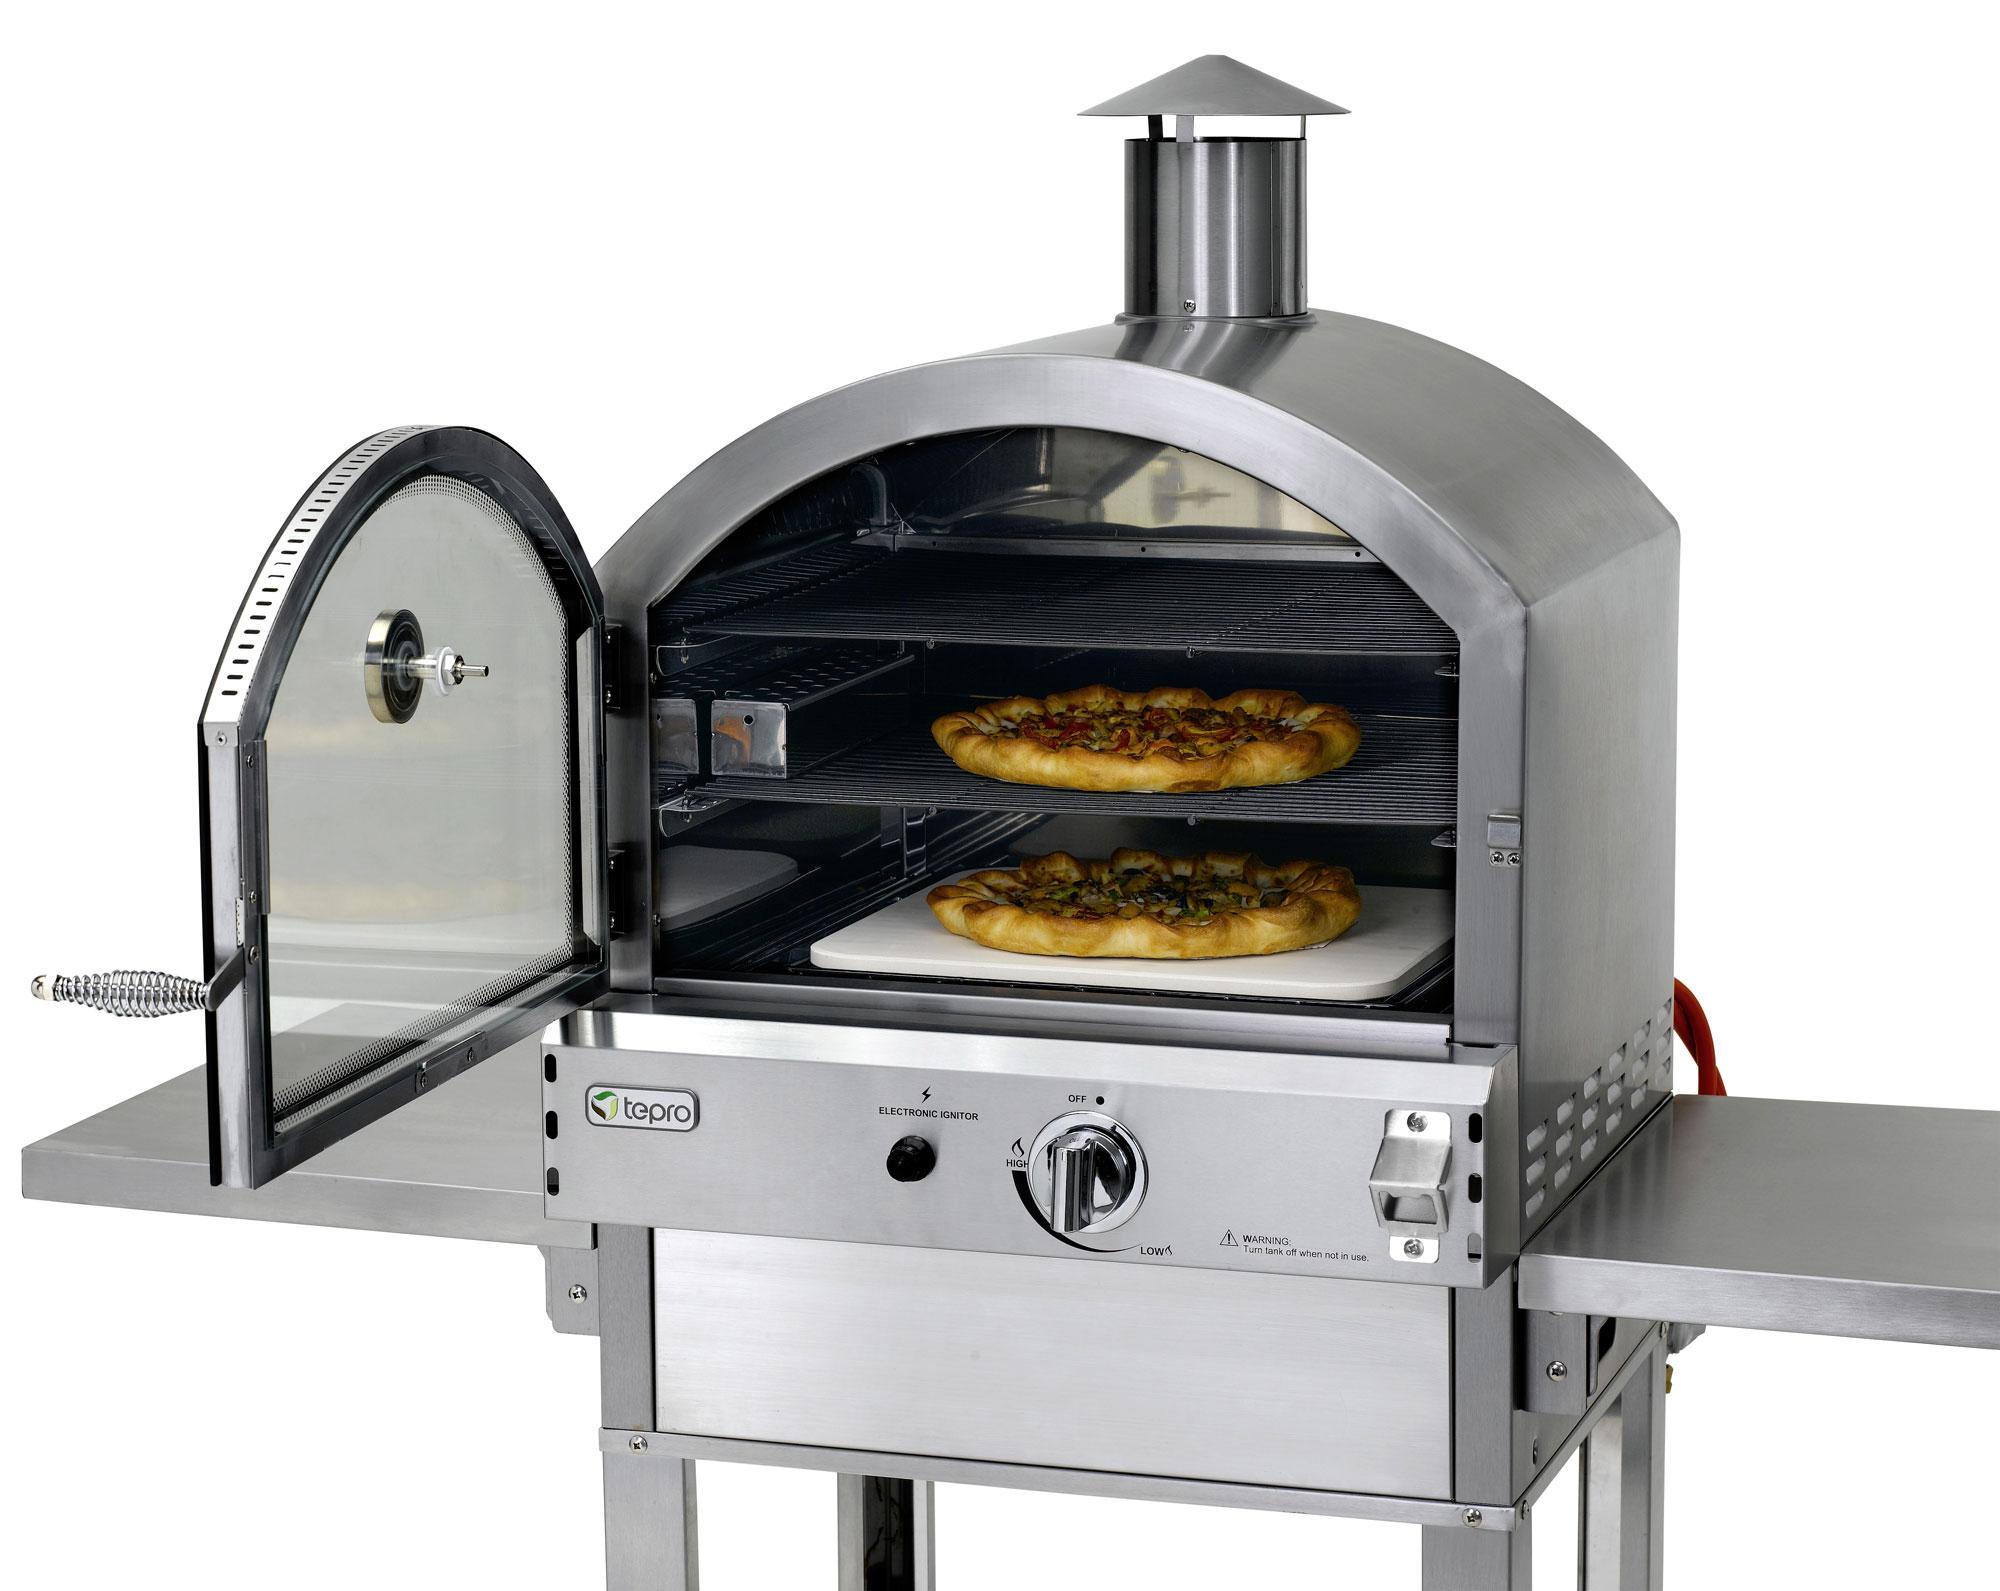 tepro pizzaofen gas gas pizzaofen flammkuchenofen santa fe bei. Black Bedroom Furniture Sets. Home Design Ideas